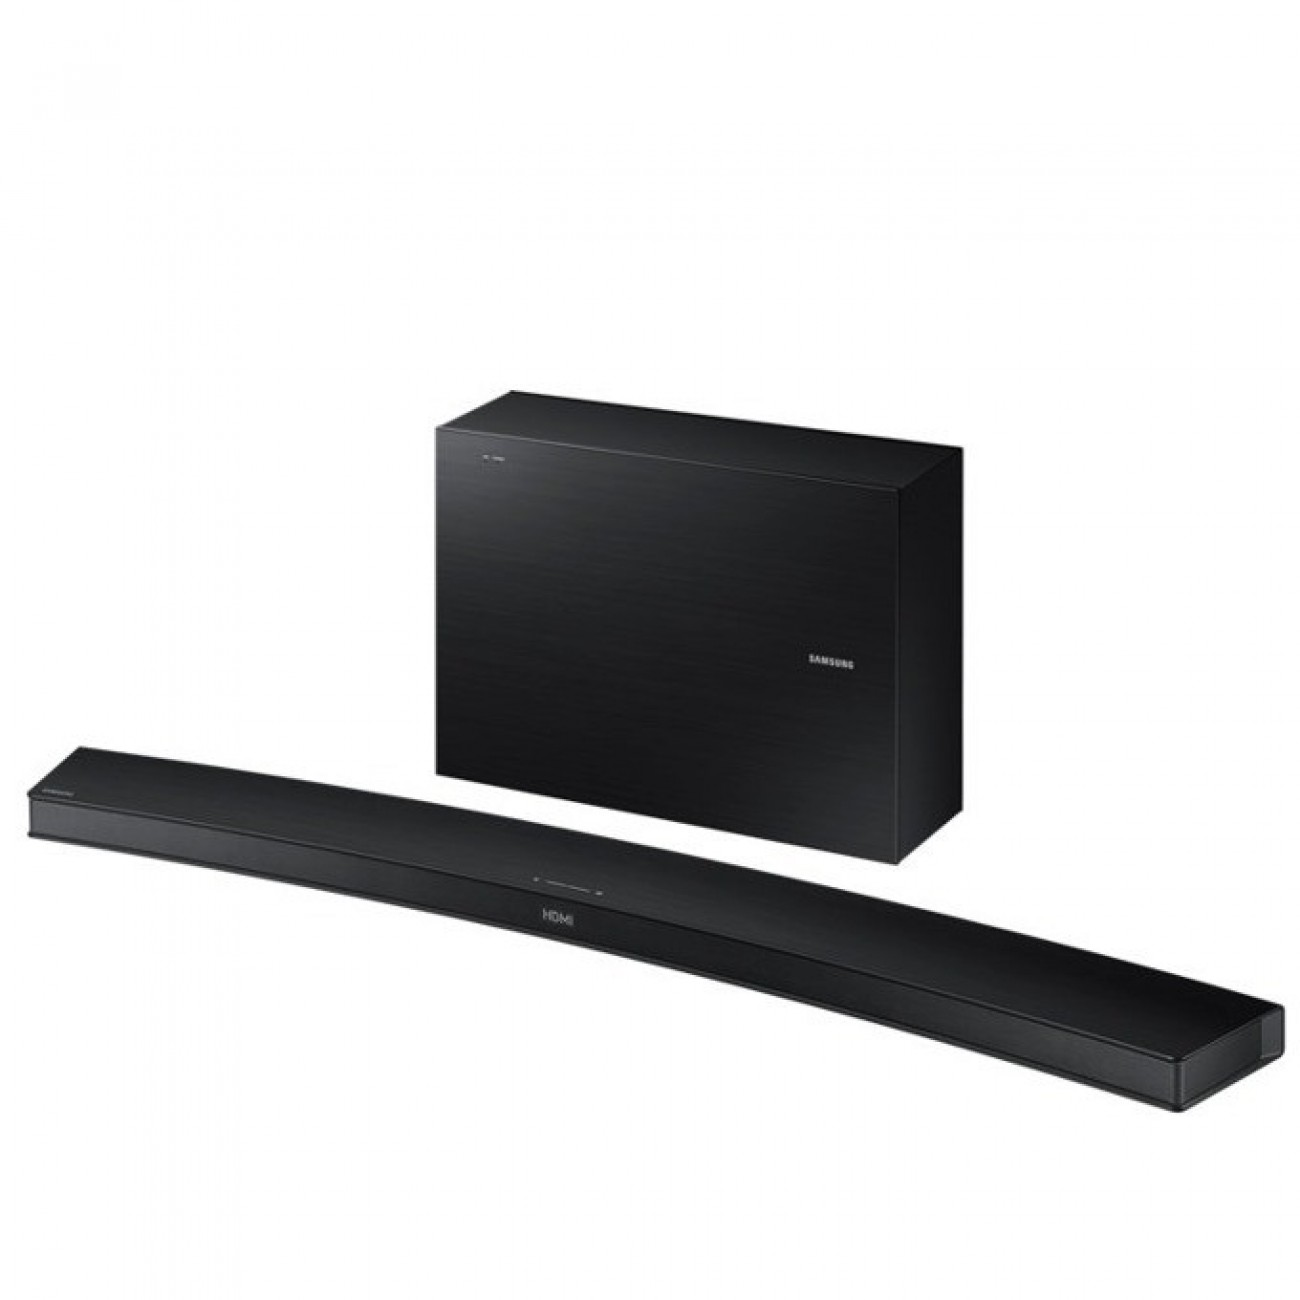 Soundbar система SAMSUNG HW-J7500R/EN, 8.1, Bluetooth, 320W RMS, черна в Домашно кино -  | Alleop